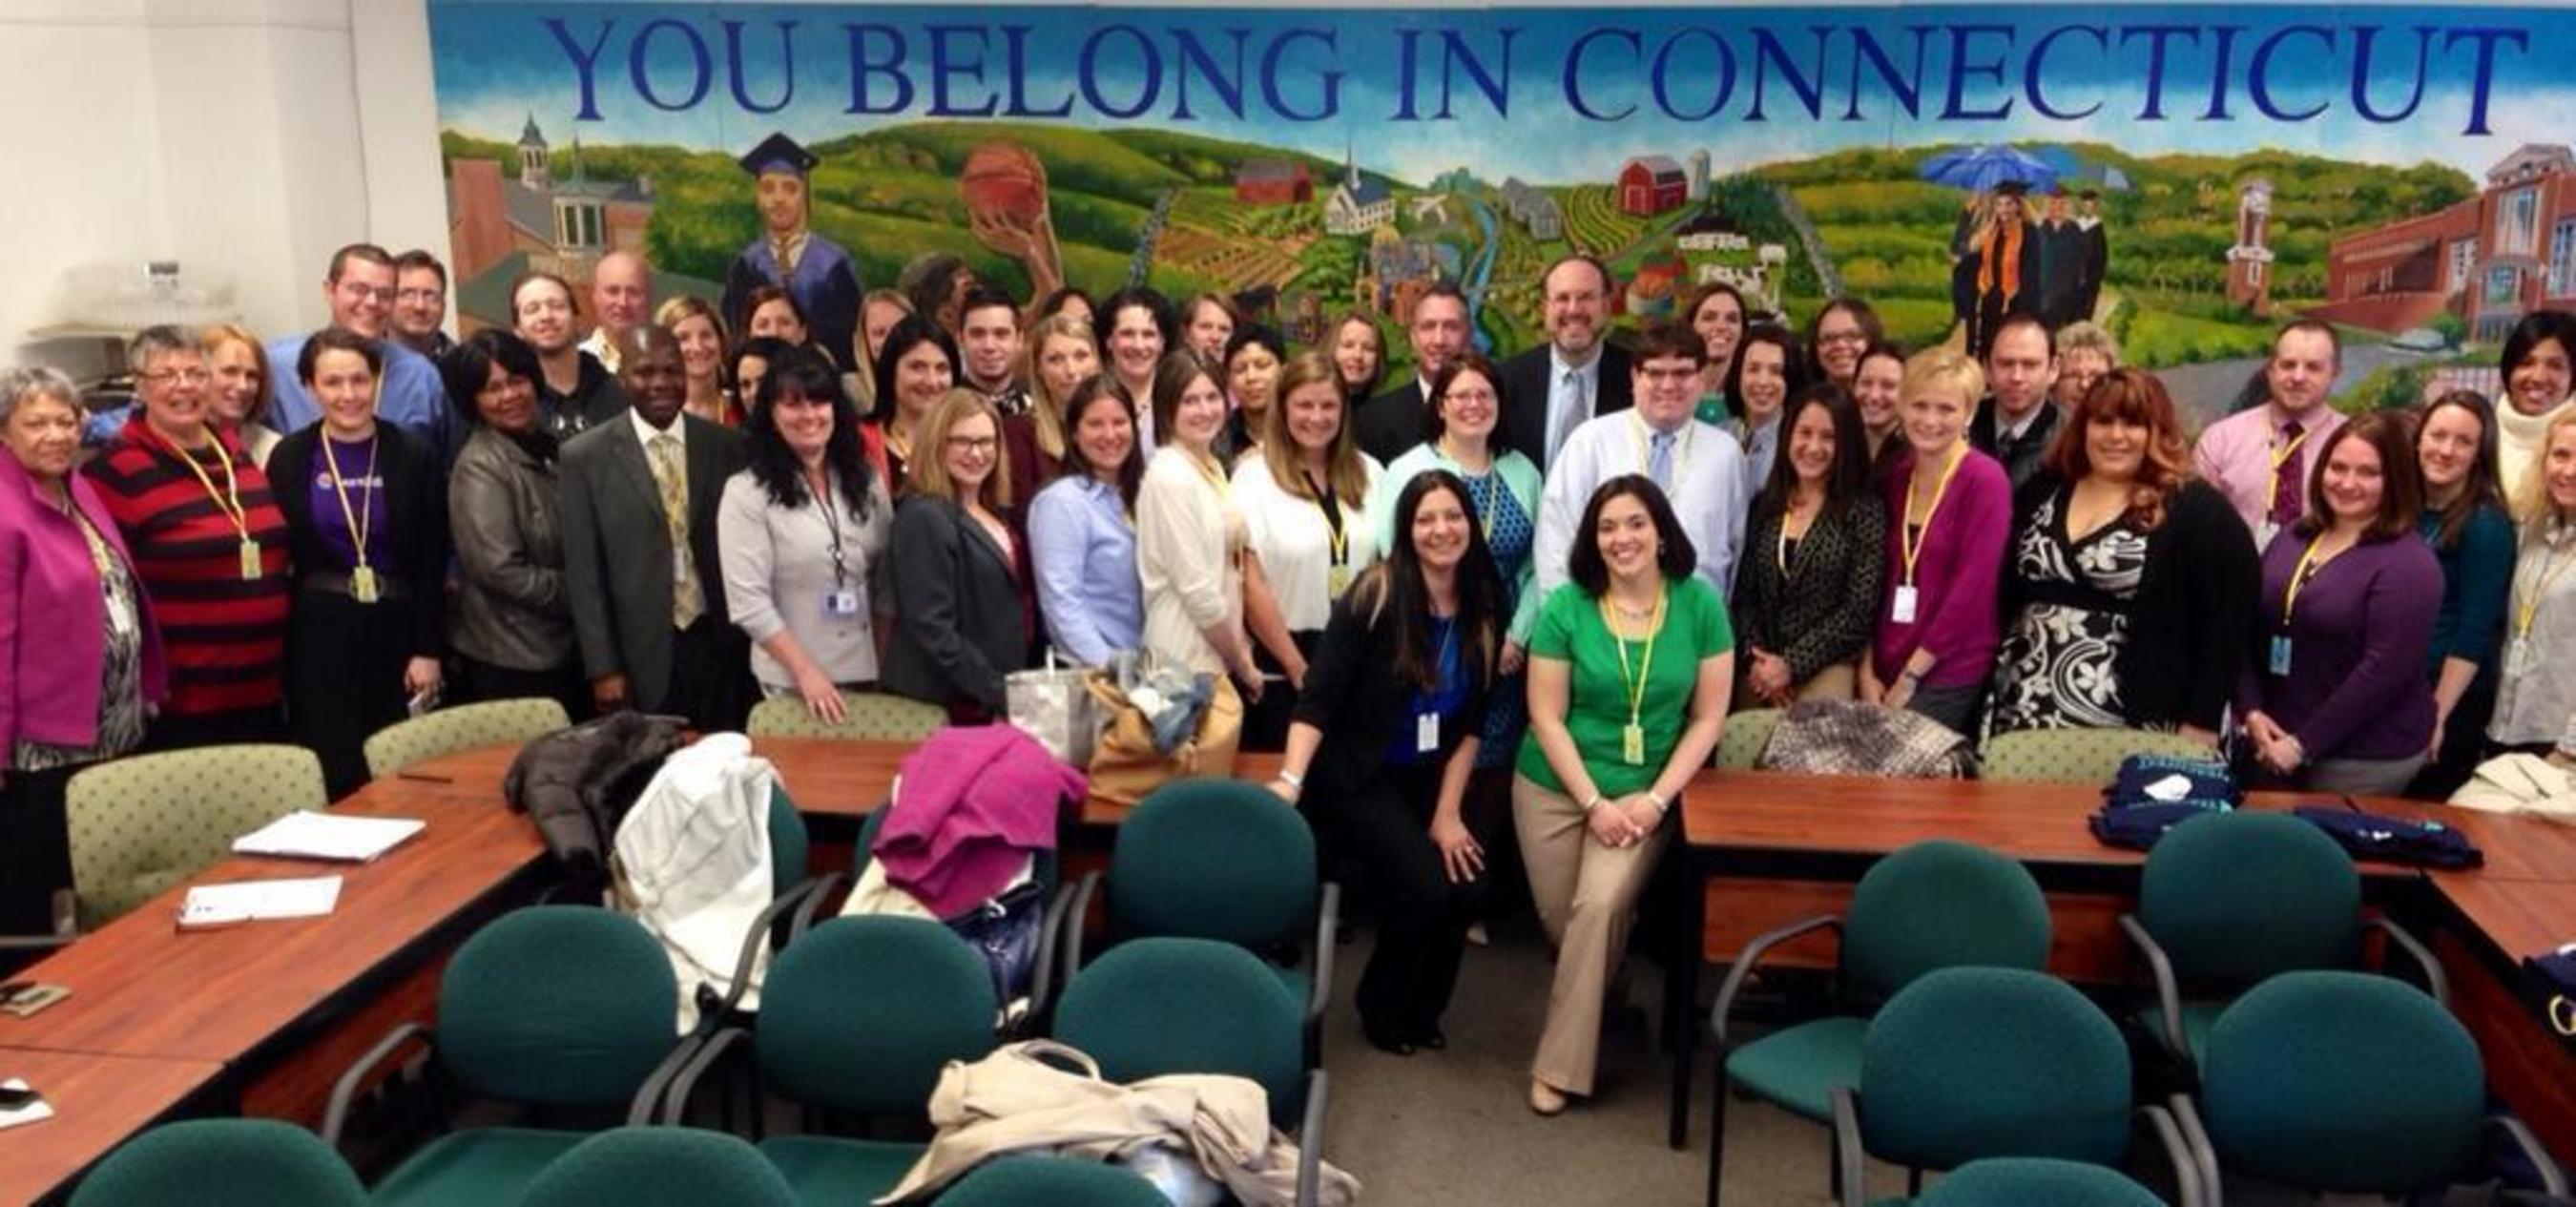 Commissioner Stefan Pryor announces members of the 2014 Connecticut Dream Team (PRNewsFoto/LearnZillion, Inc.)